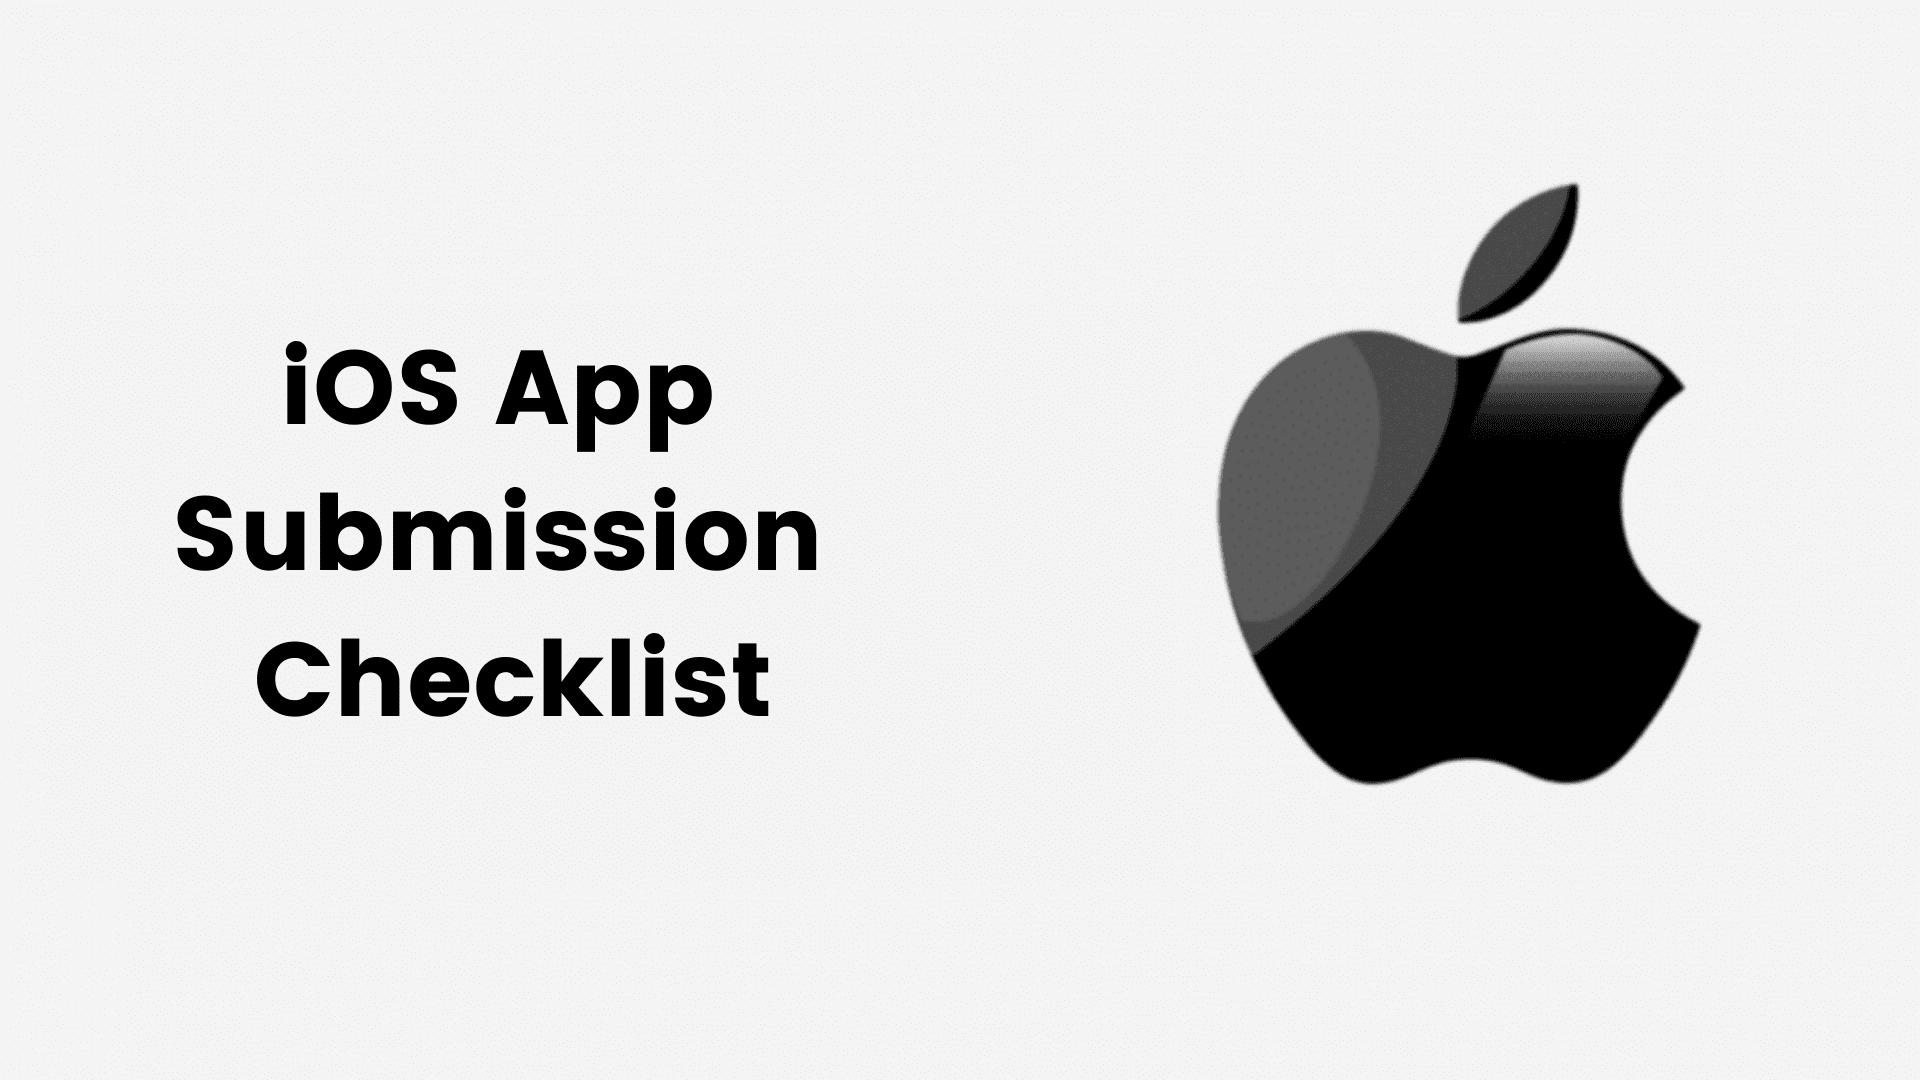 iOS app submission checklist